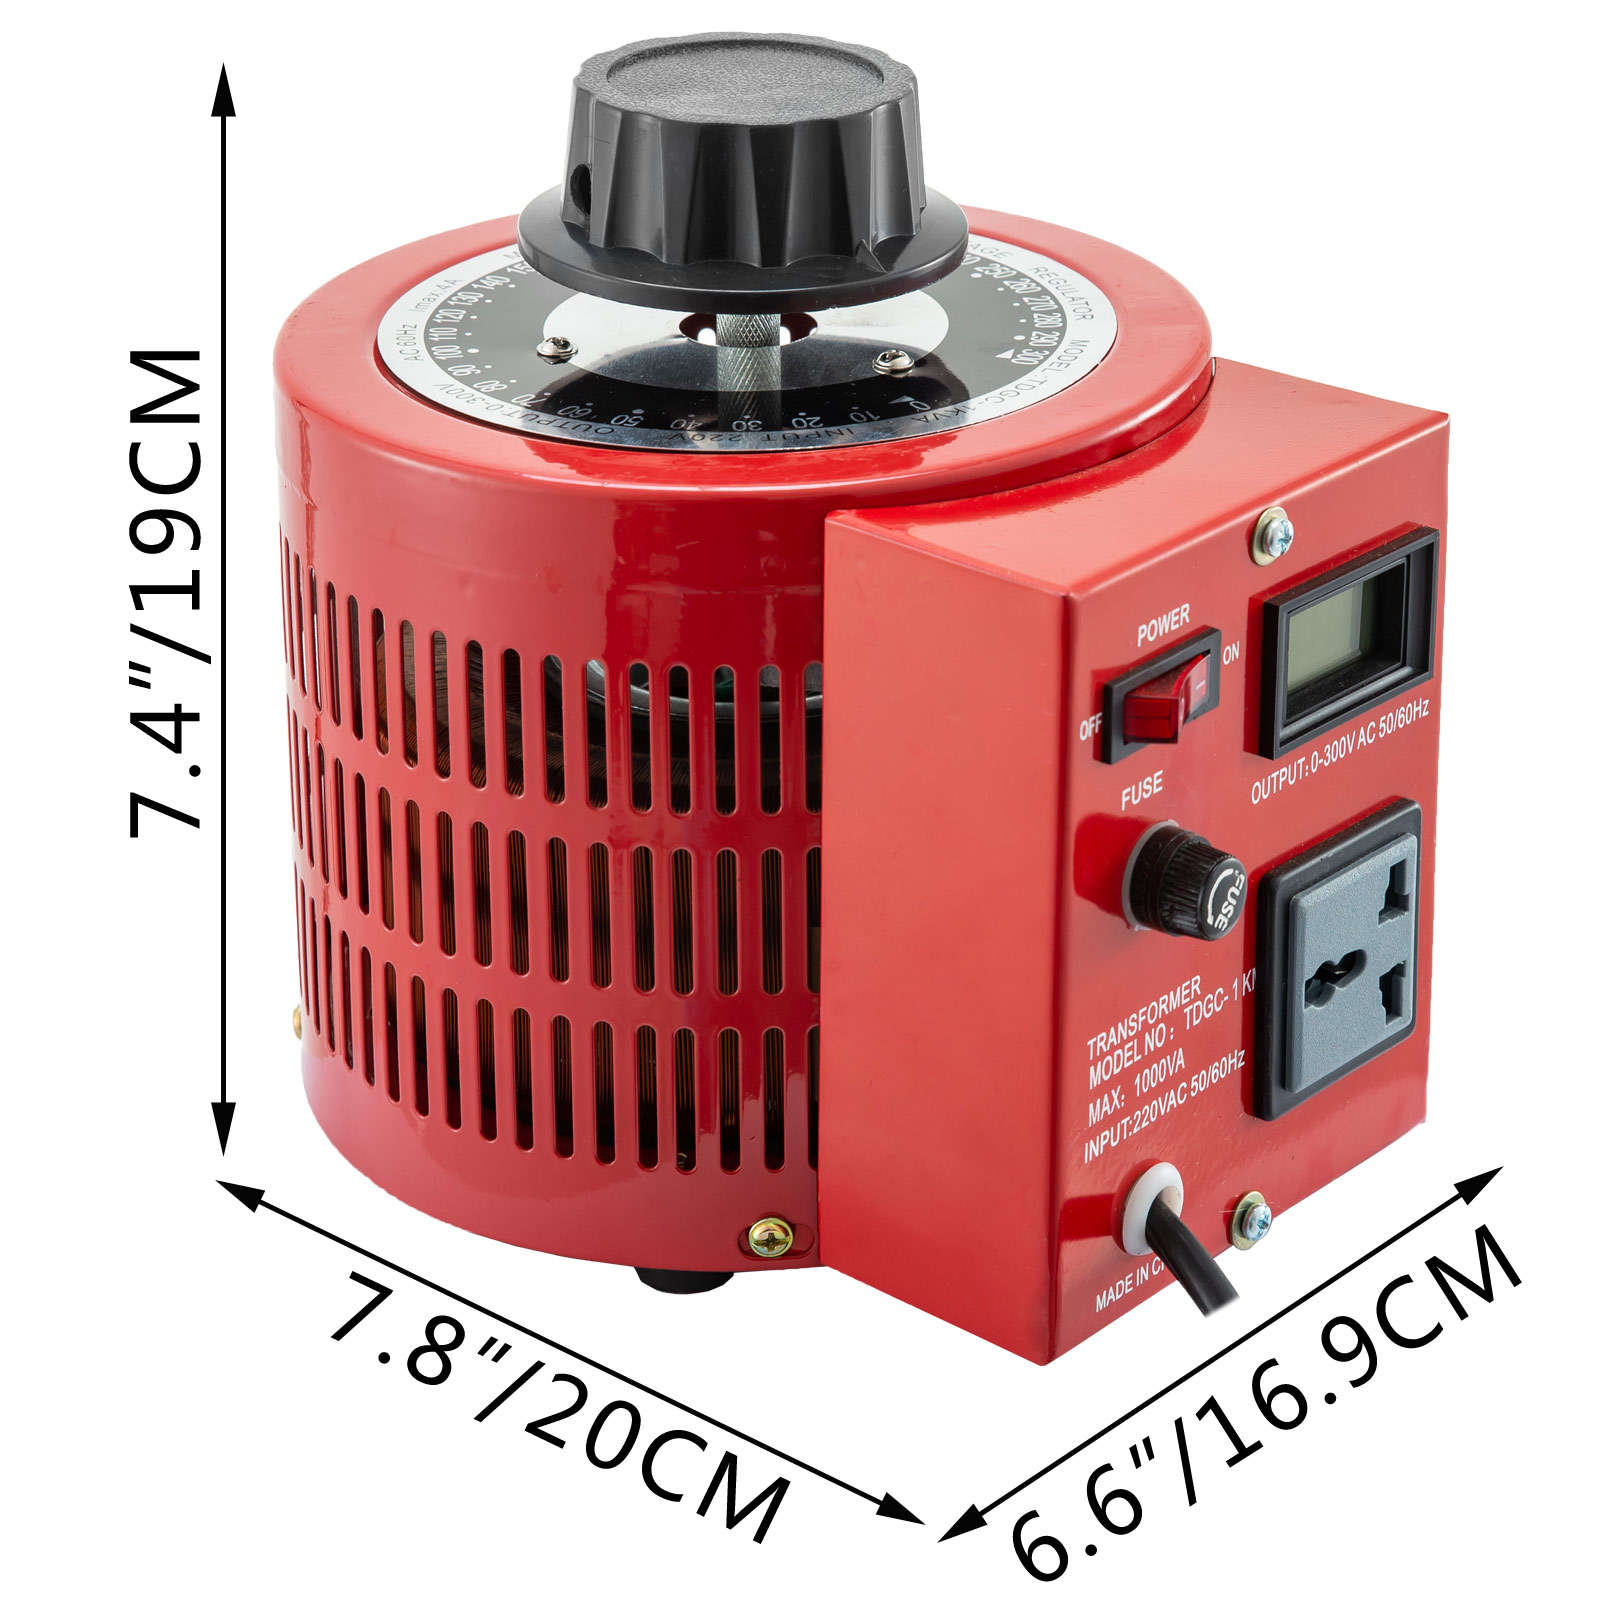 Auto-Variac-Variable-Transformer-0-5-1-2-3KVA-Regulator-pure-copper-coil-220V thumbnail 32